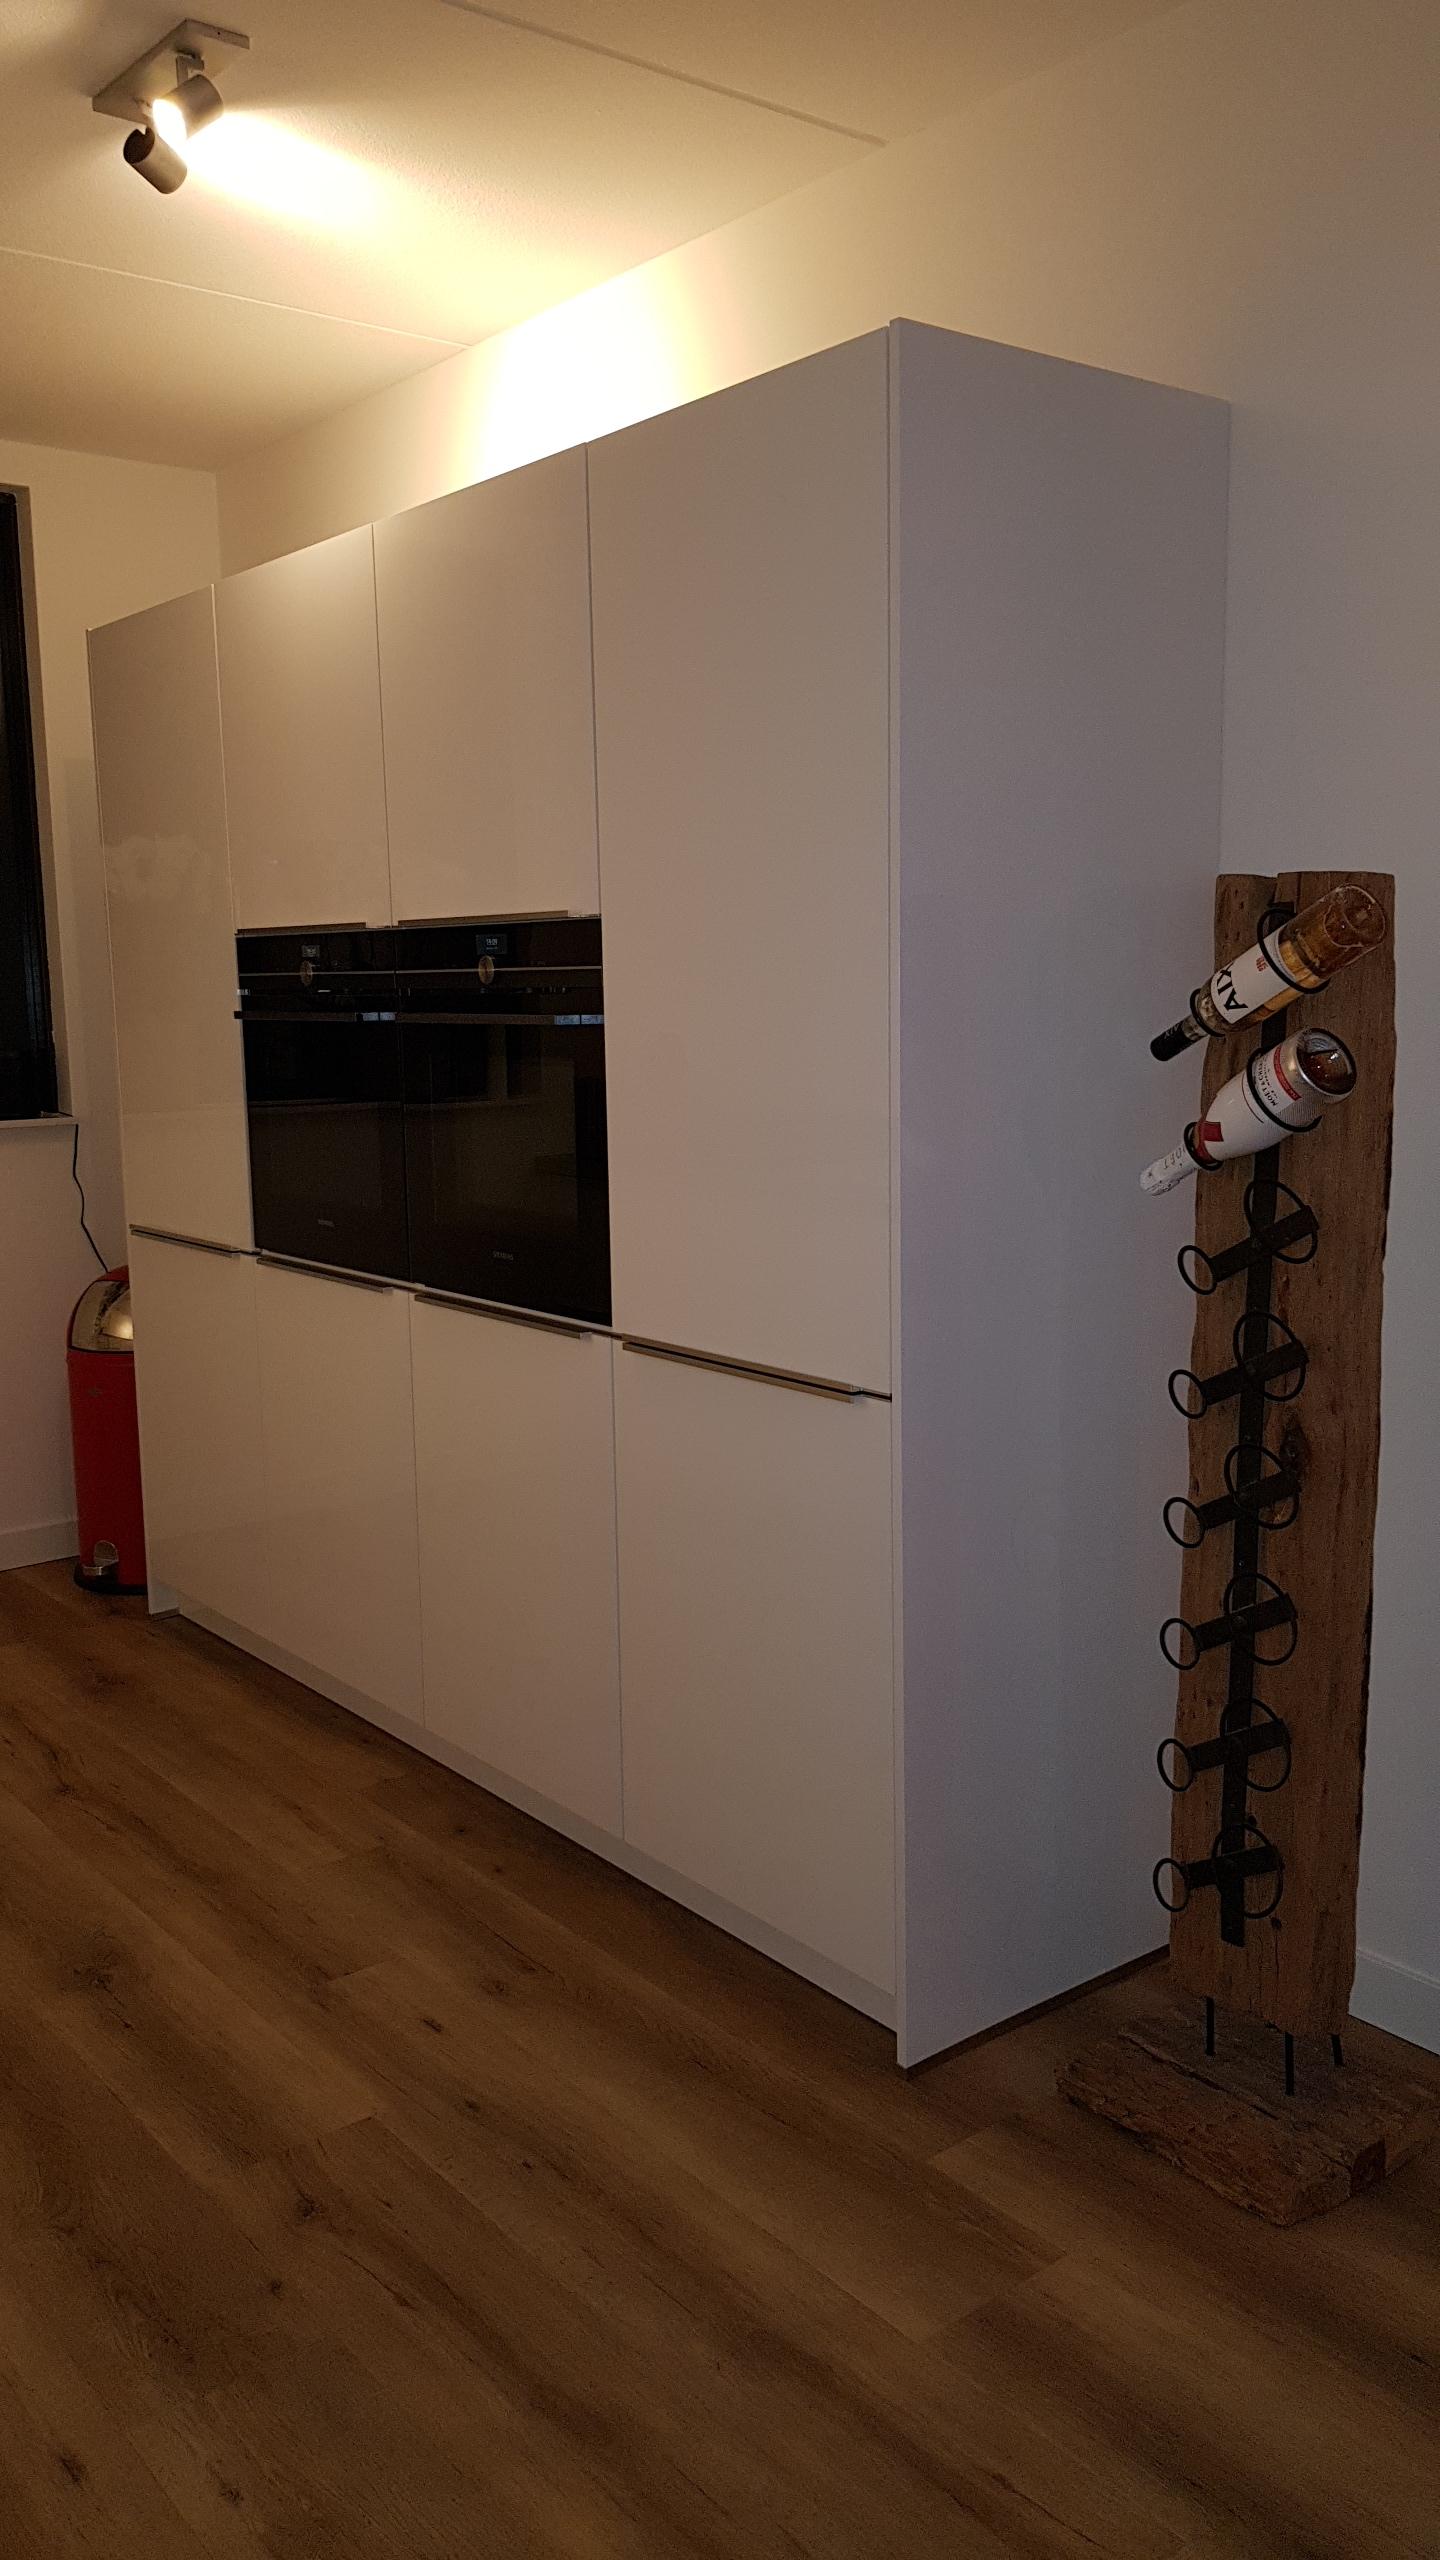 Onwijs Moderne keukens - Looqify LV-19